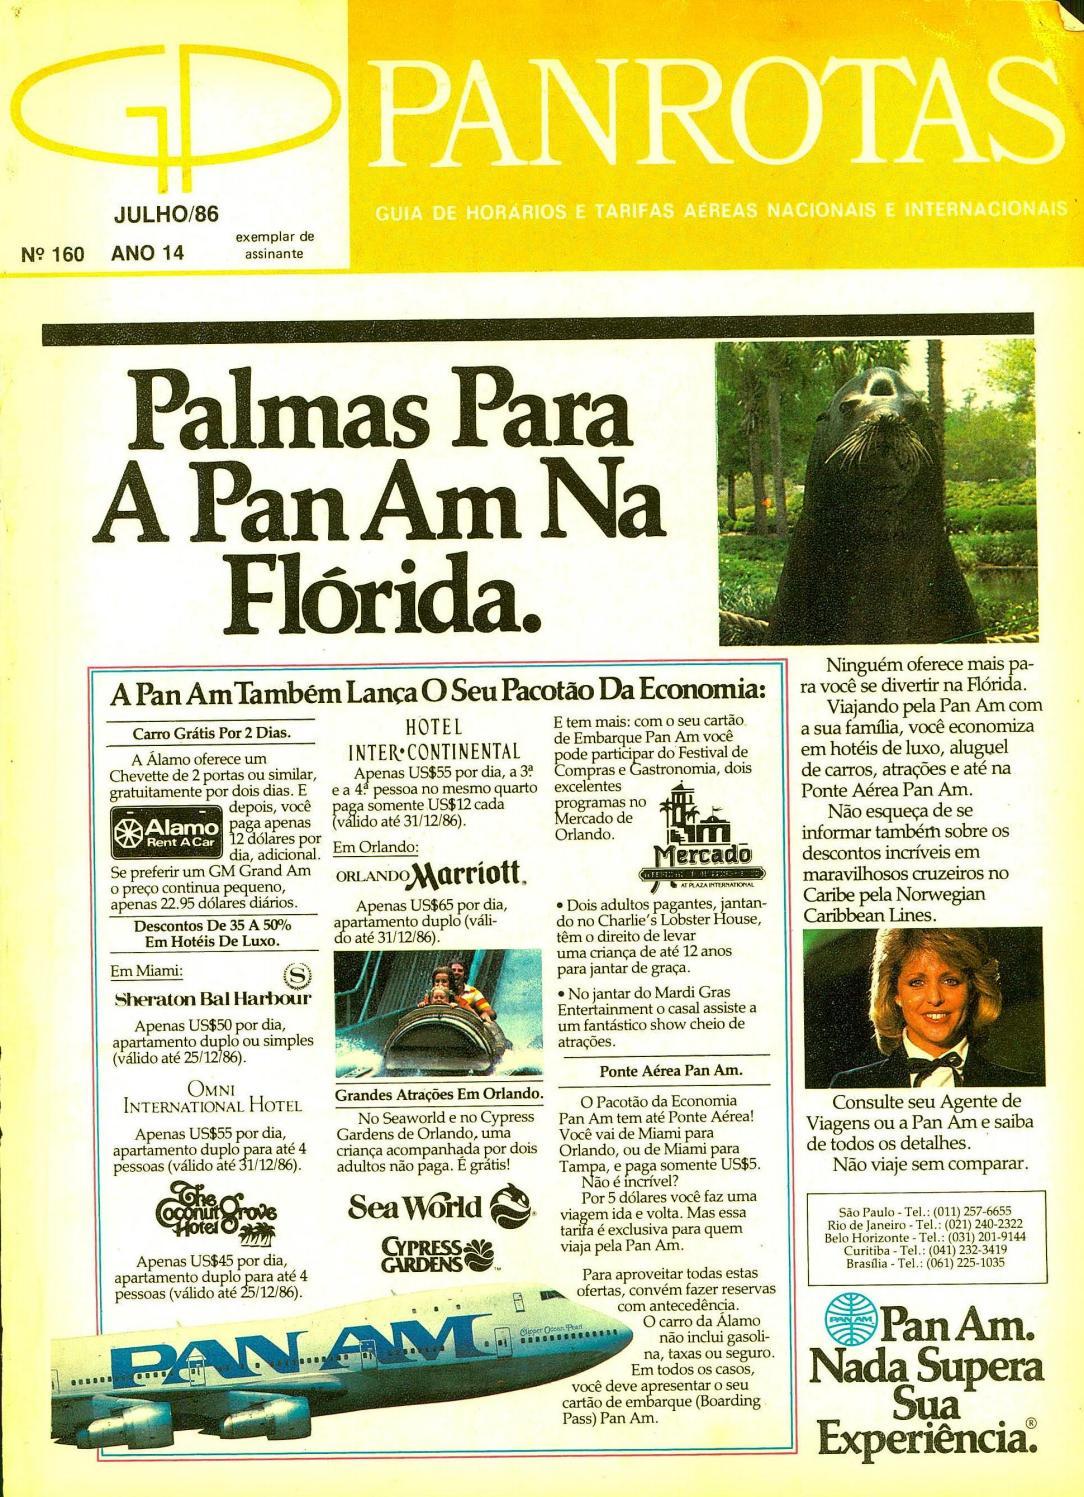 Guia PANROTAS - Edição 160 - Julho 1986 by PANROTAS Editora - issuu 9a661d56afb